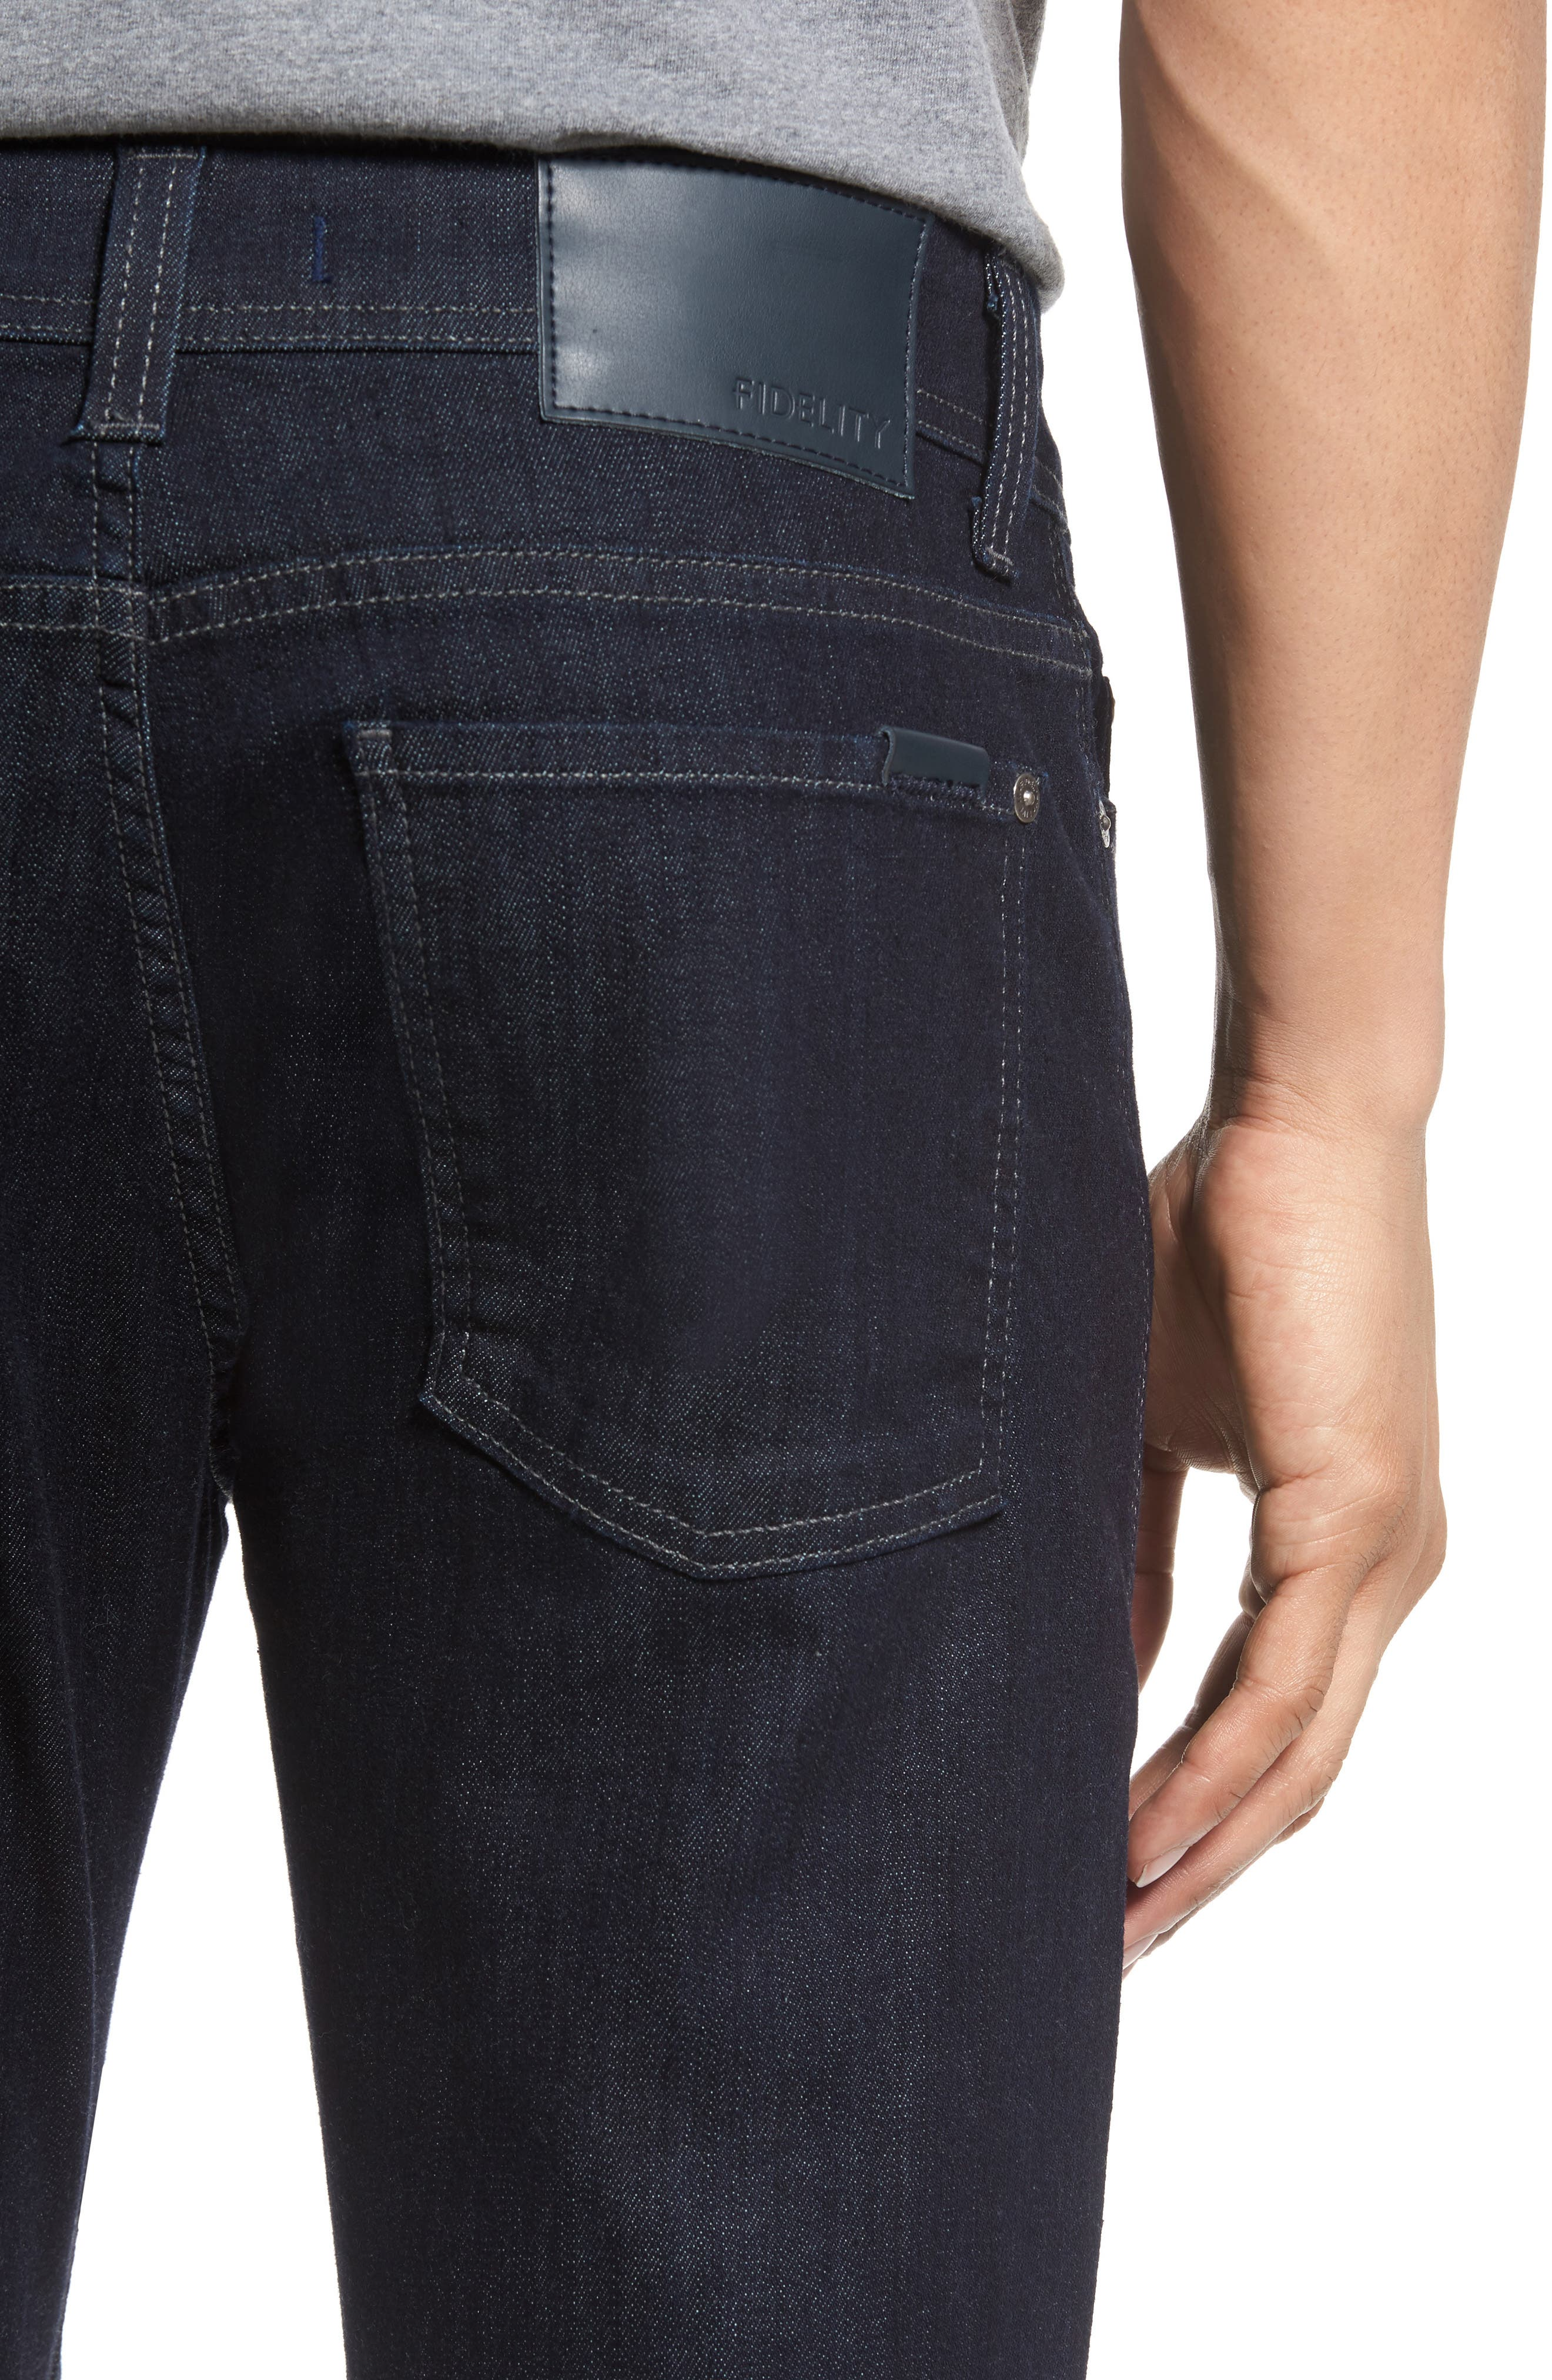 Torino Slim Fit Jeans,                             Alternate thumbnail 4, color,                             Capital Blue